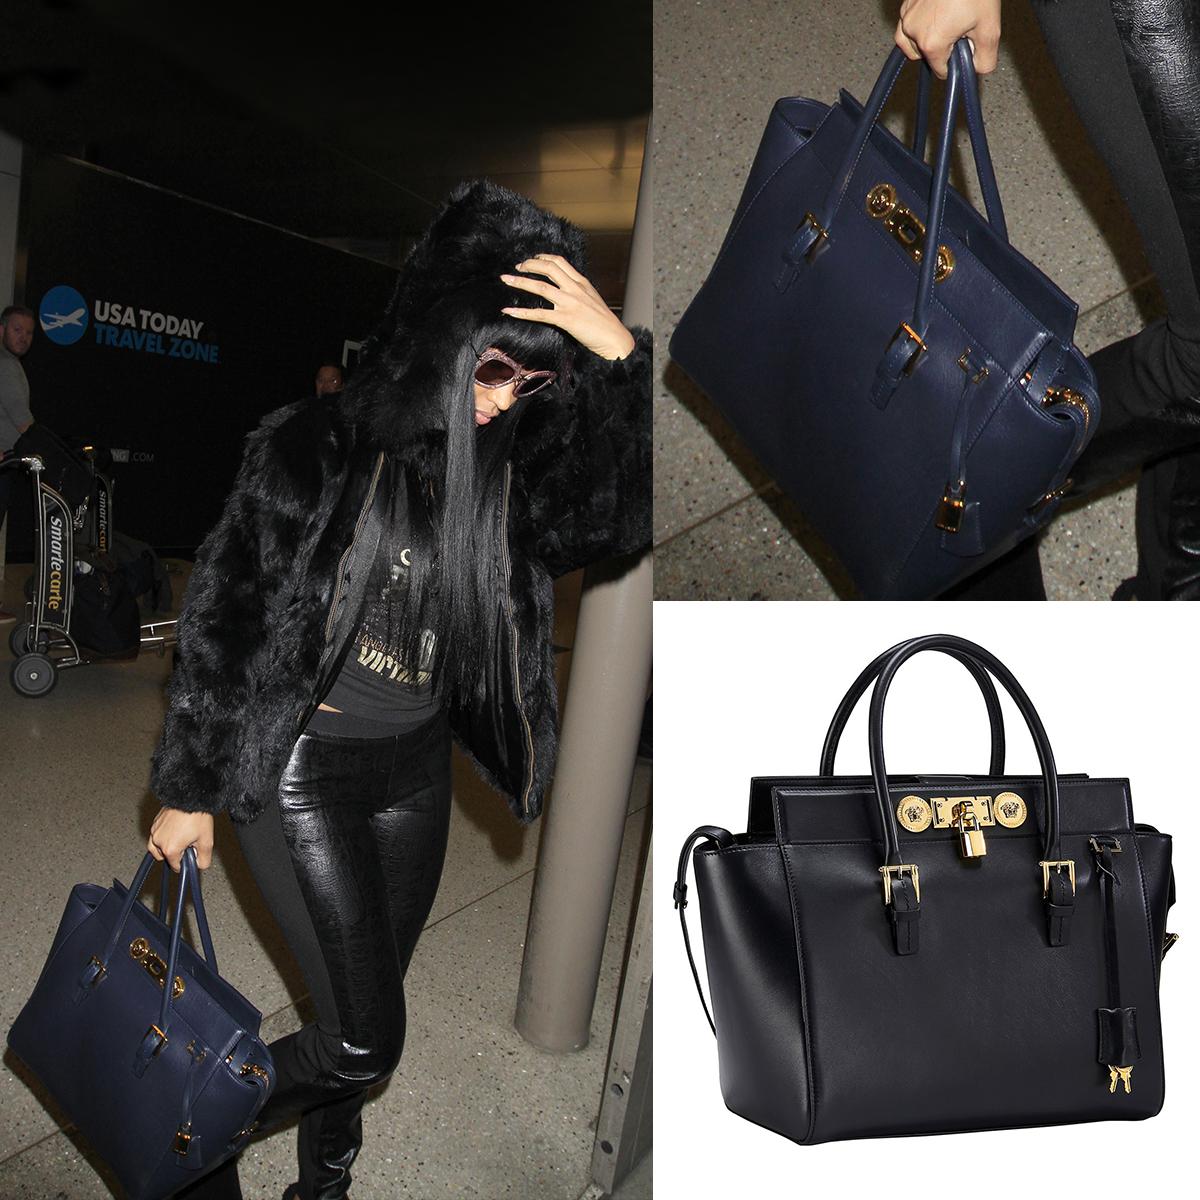 Nicki Minaj Was Gorgeous At Lax Airport Carrying The Blue Versace Lock Signature Bag Versacesignaturebag Versacecelebrities Versace Outfit Fashion Versace